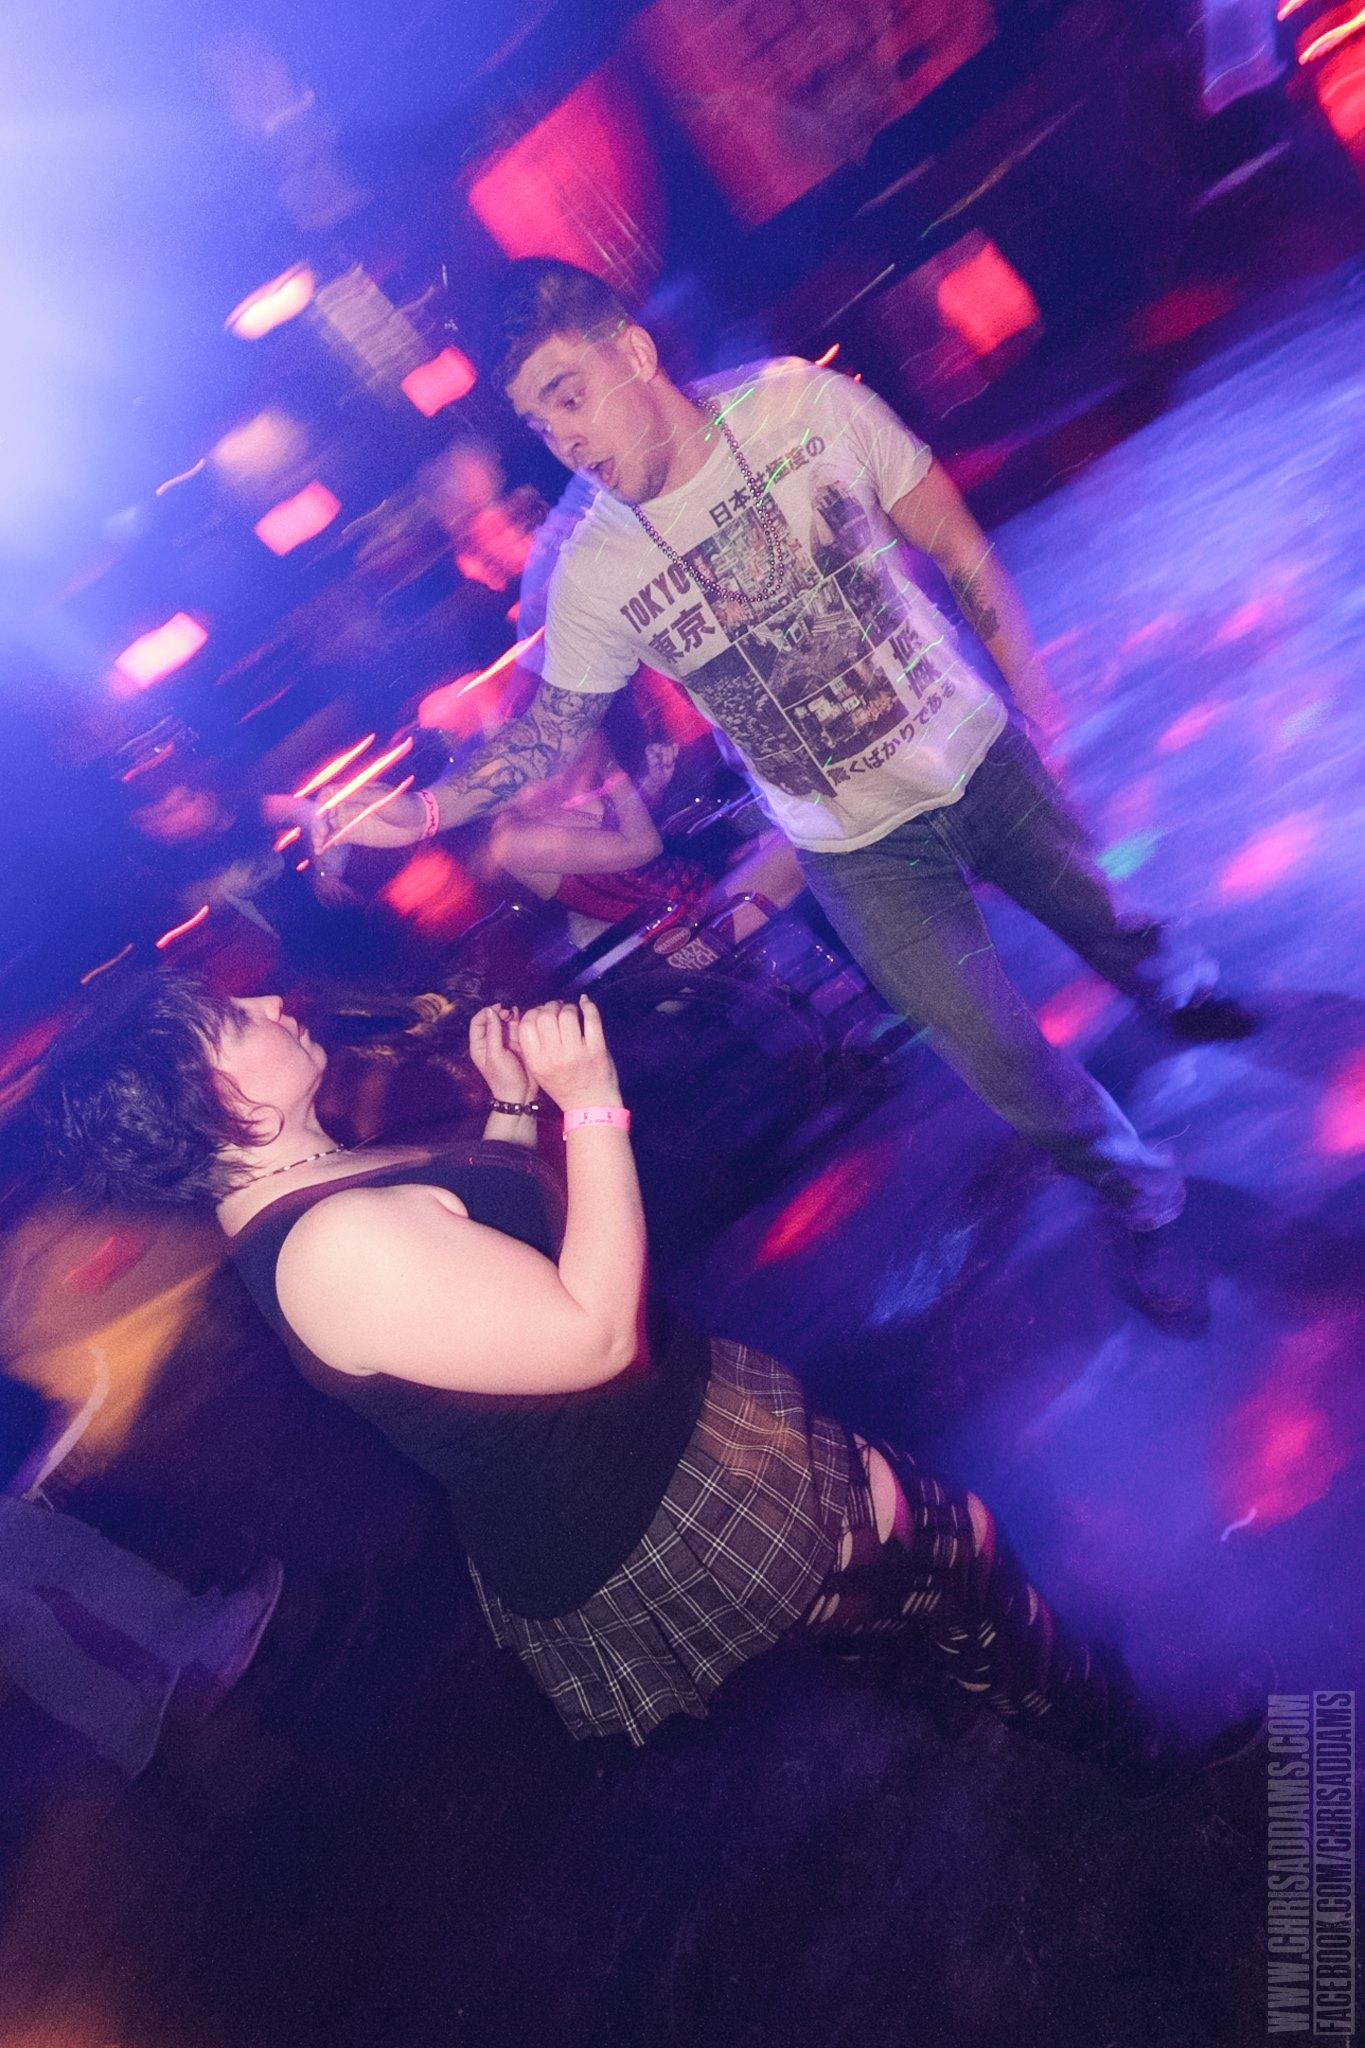 TheHavenClub-Goth-Industrial-Dance-Alternative-Northampton-MA (55).jpg